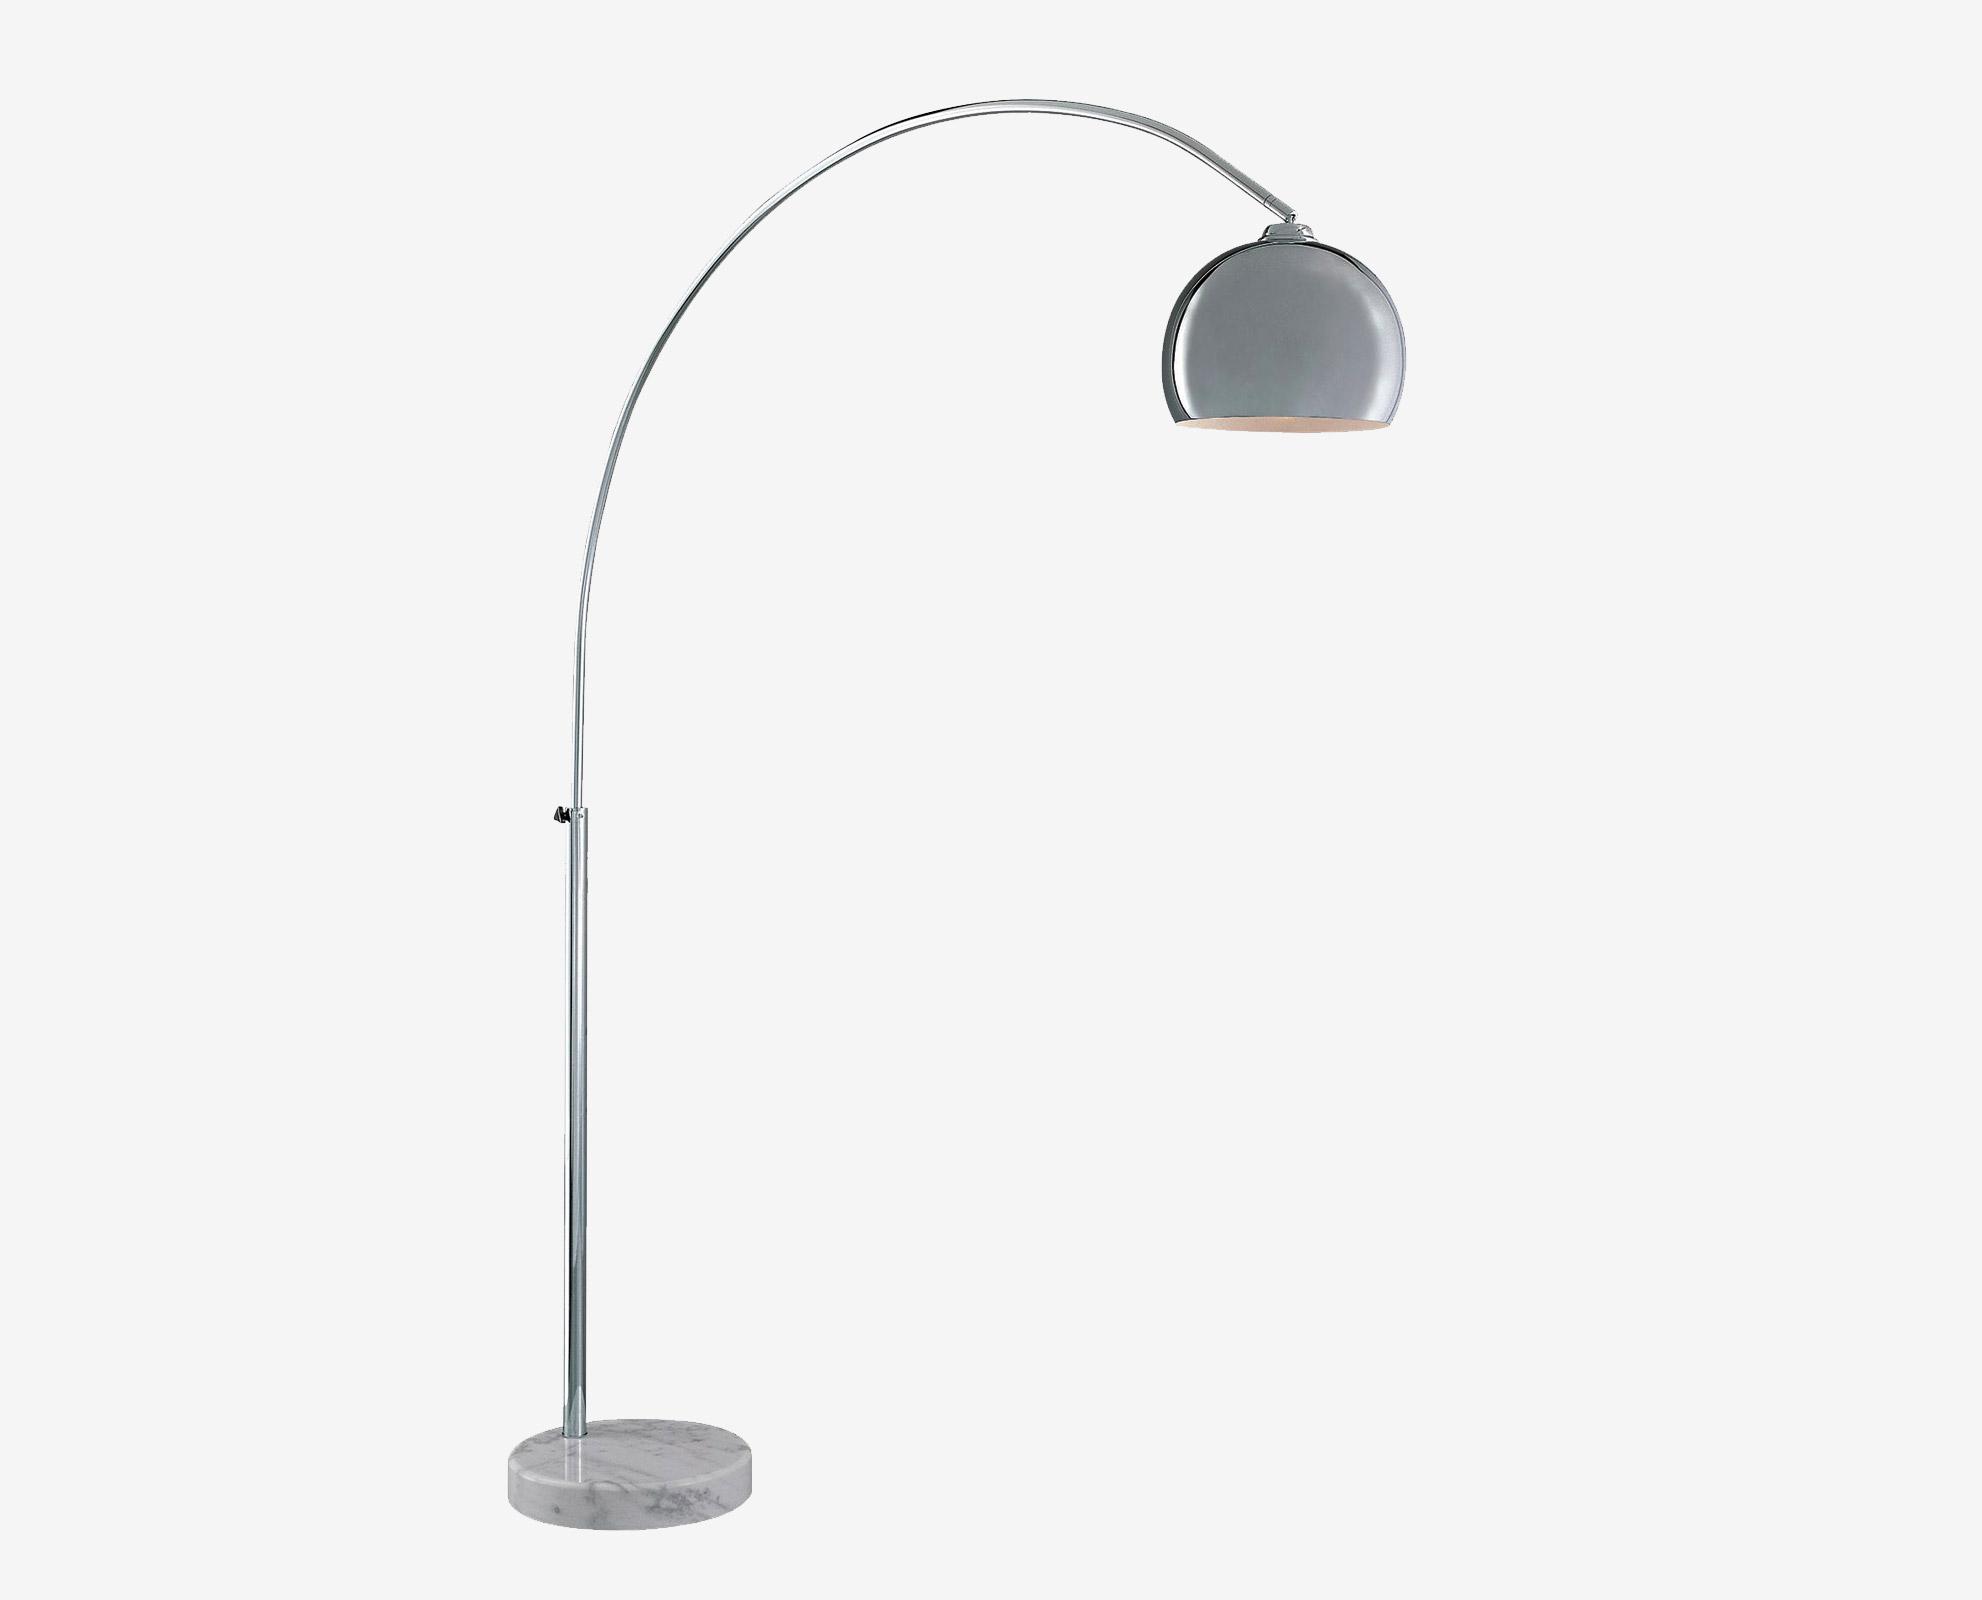 arc floor lamp KAEHYQS